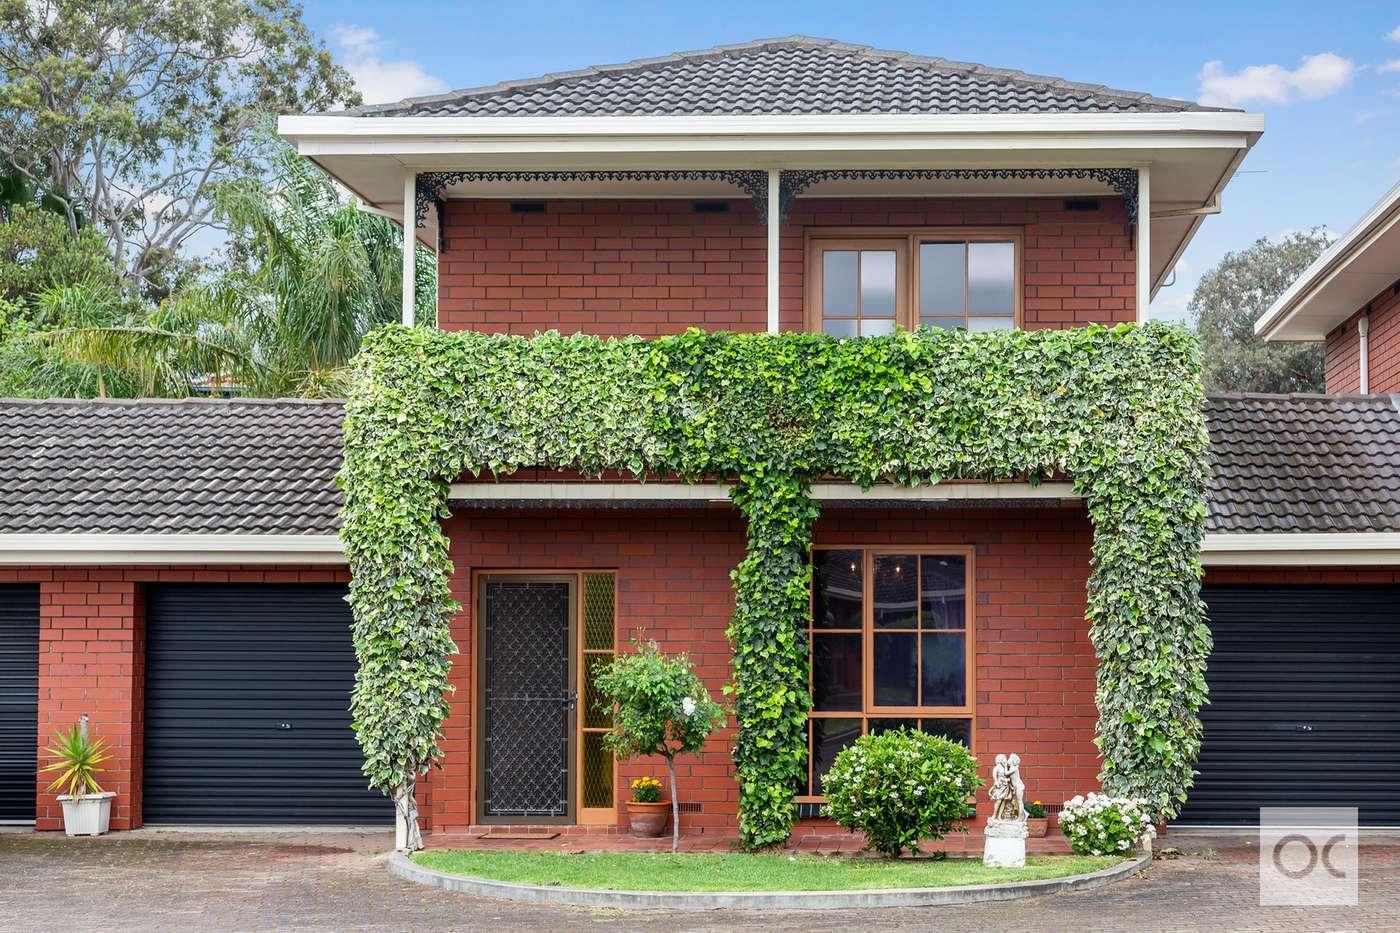 Main view of Homely house listing, 9/14-16 Long Street, Plympton, SA 5038